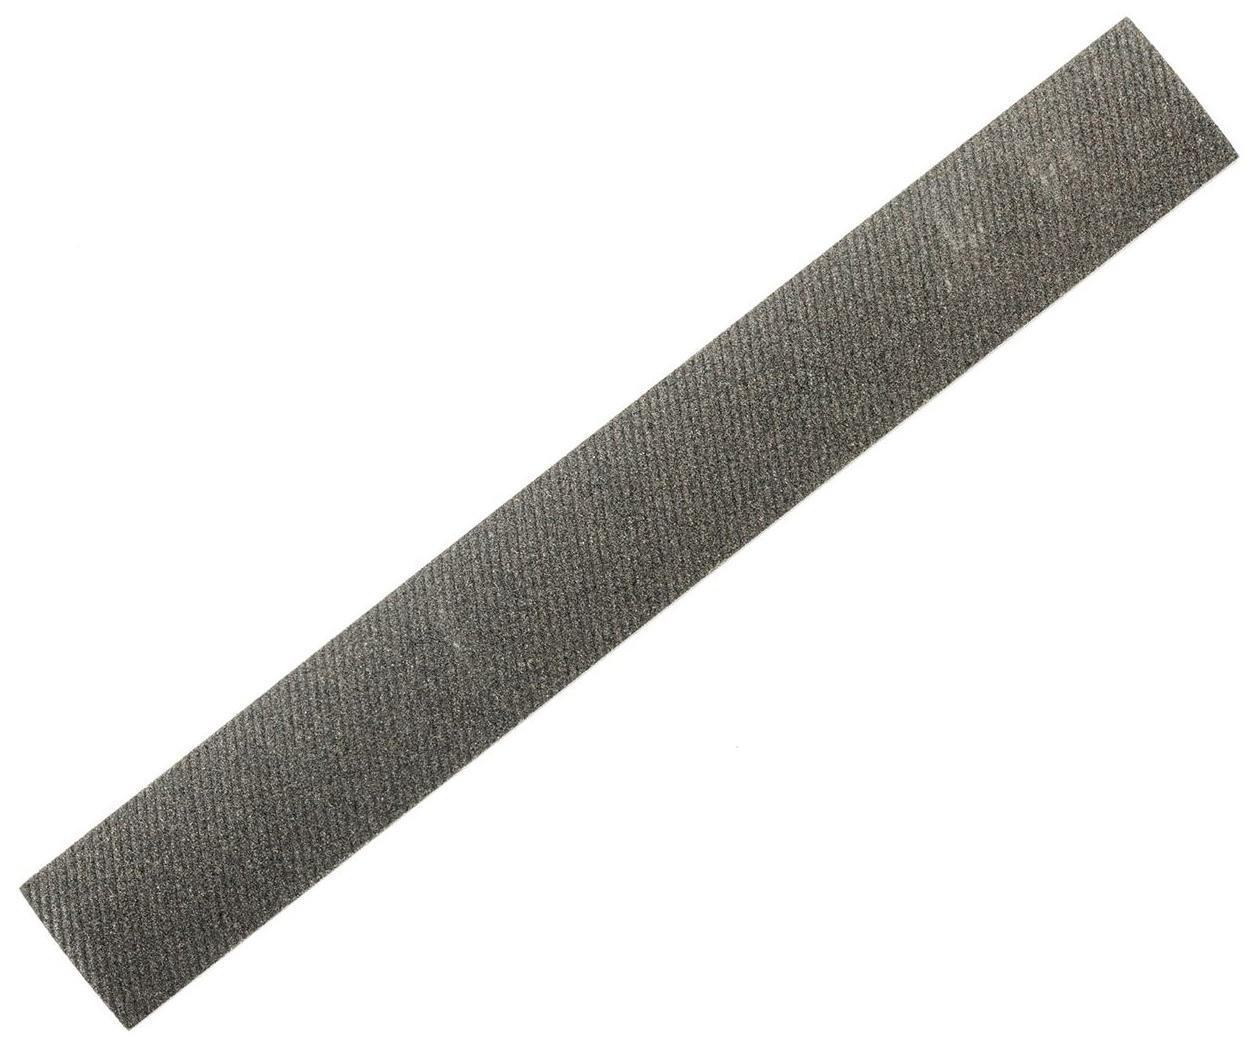 Брусок точильный Lansky Heavy Duty Sharpener (LHONE)